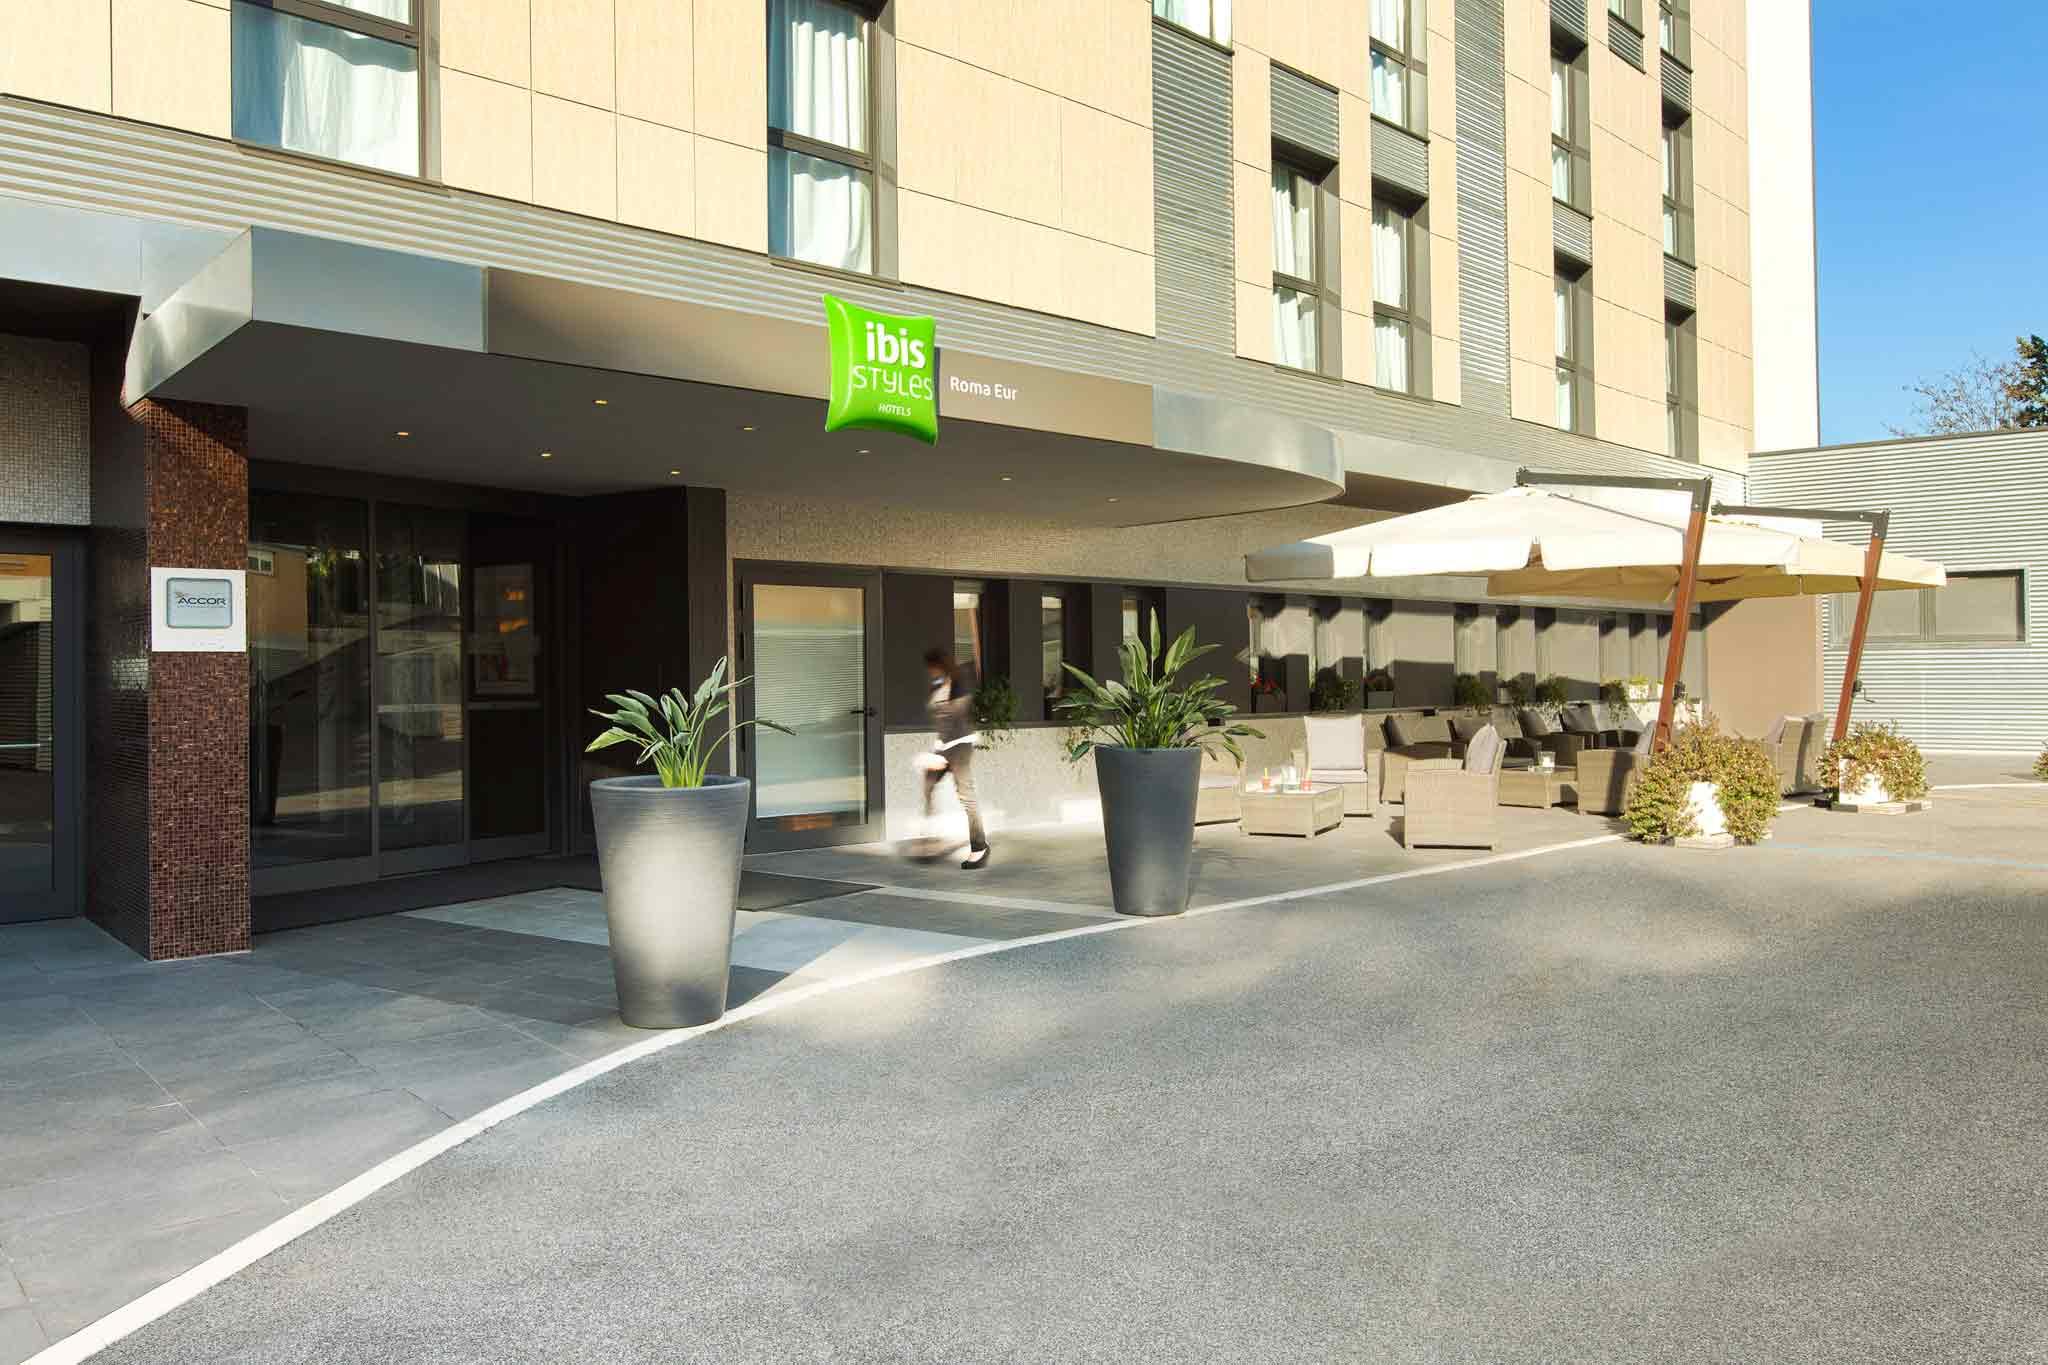 Hotell – ibis Styles Roma Eur